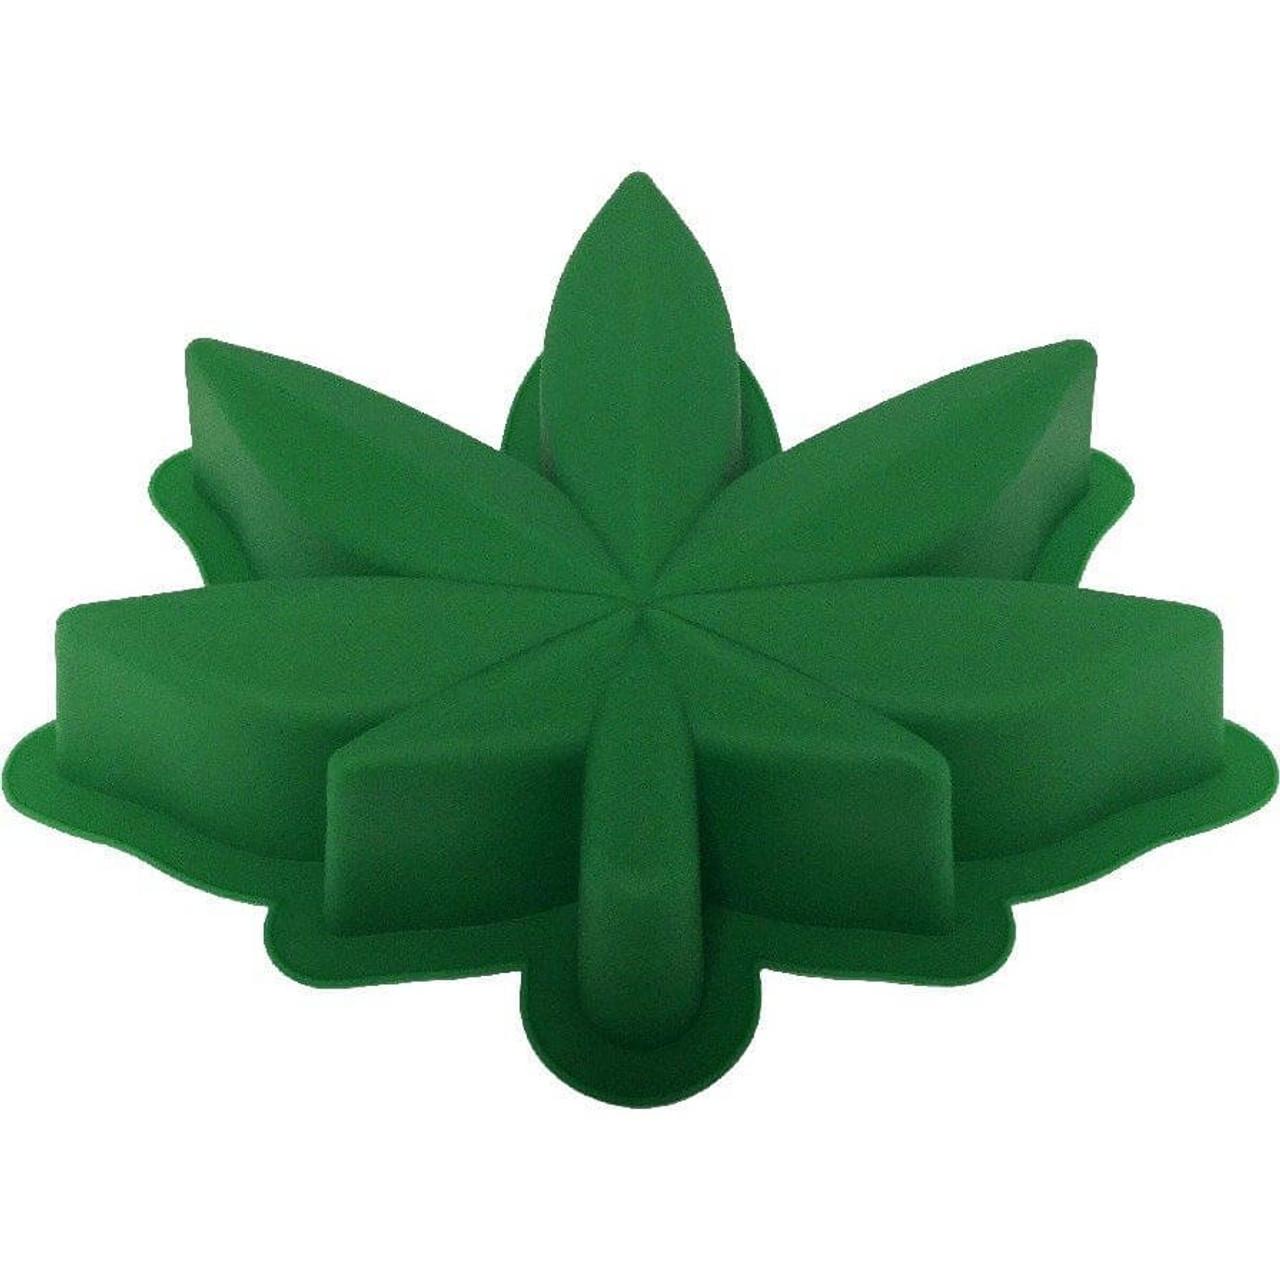 Marijuana Silicone Cake Mold